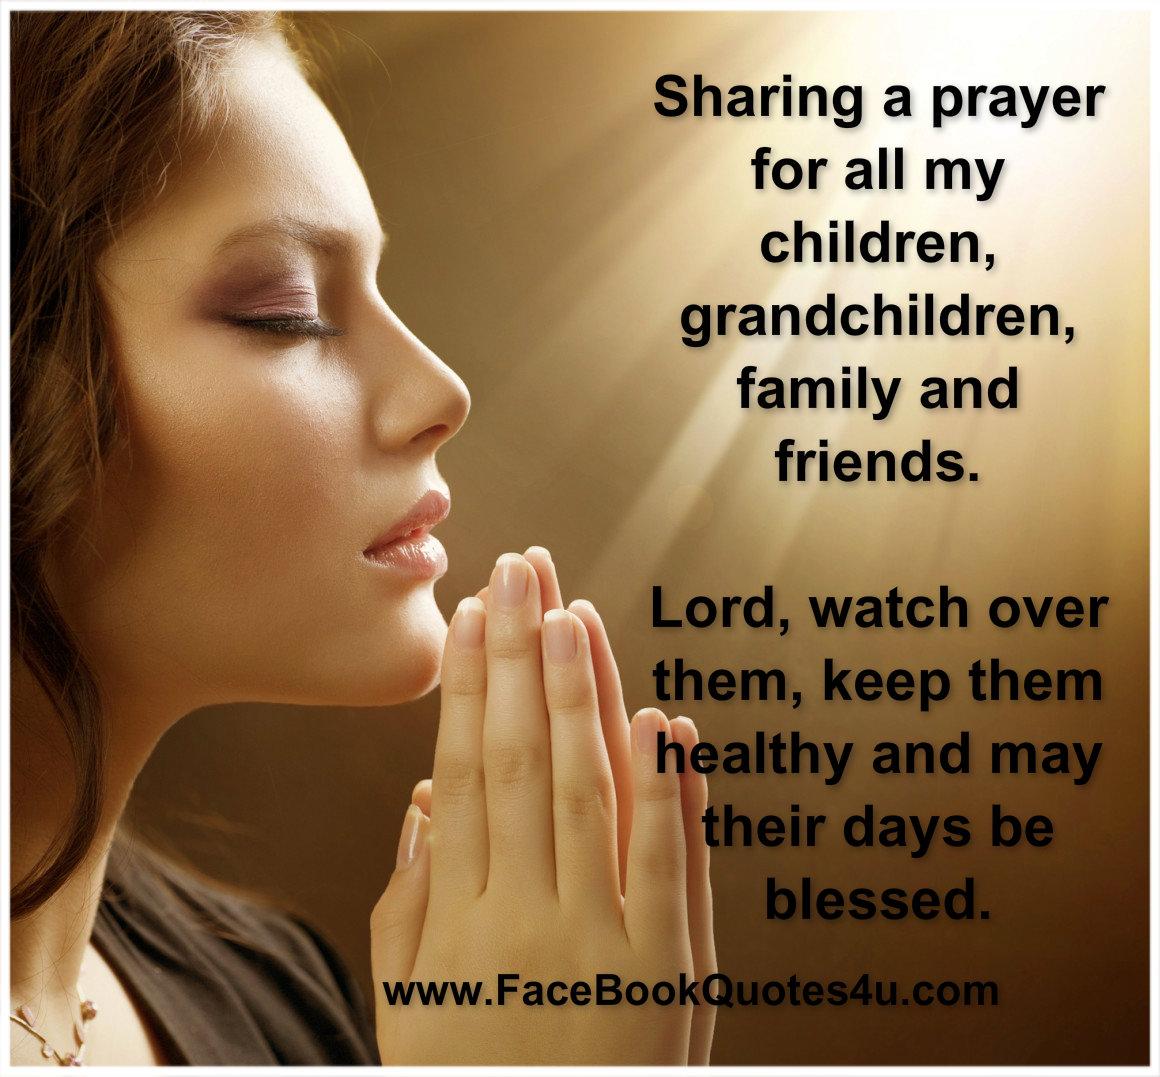 pray for quotes quotesgram